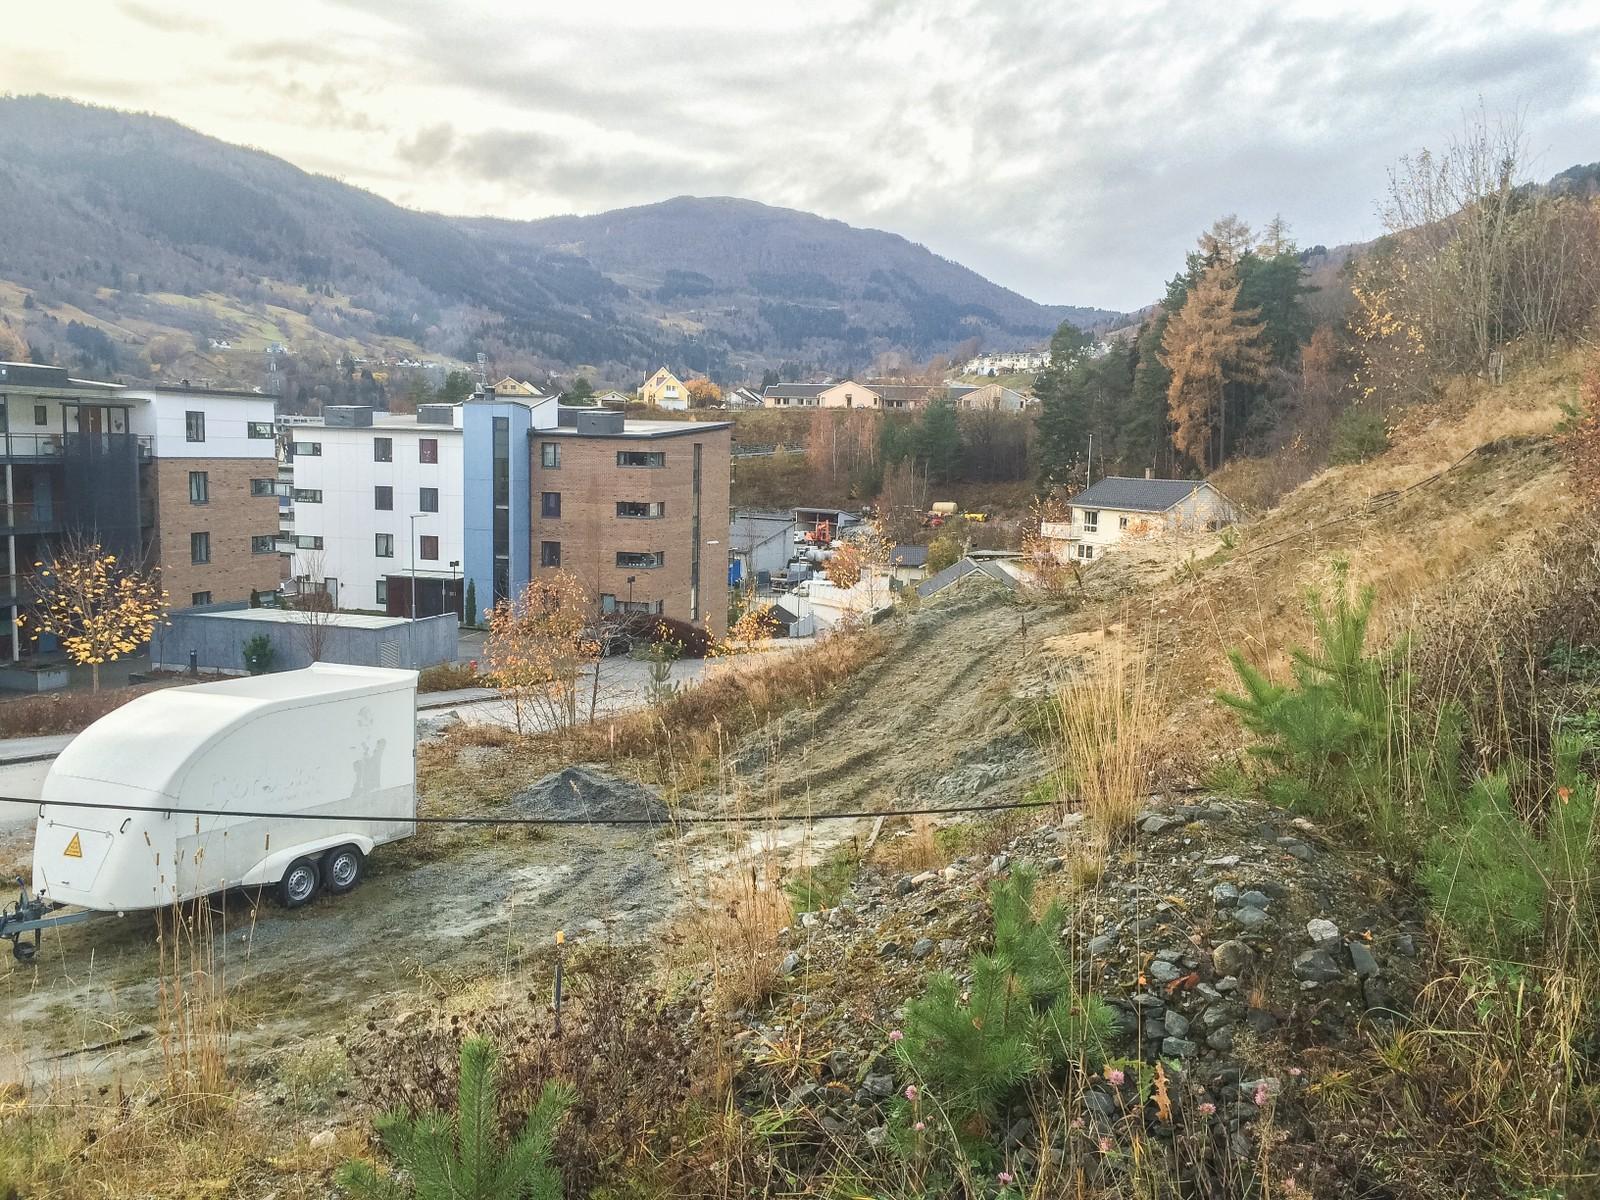 NYE LEILEGHEITER: 54 nye leilegheiter er planlagde på Ulvahaugen. Kostnad 170 millionar, første byggjetrinn startar truleg på nyåret.